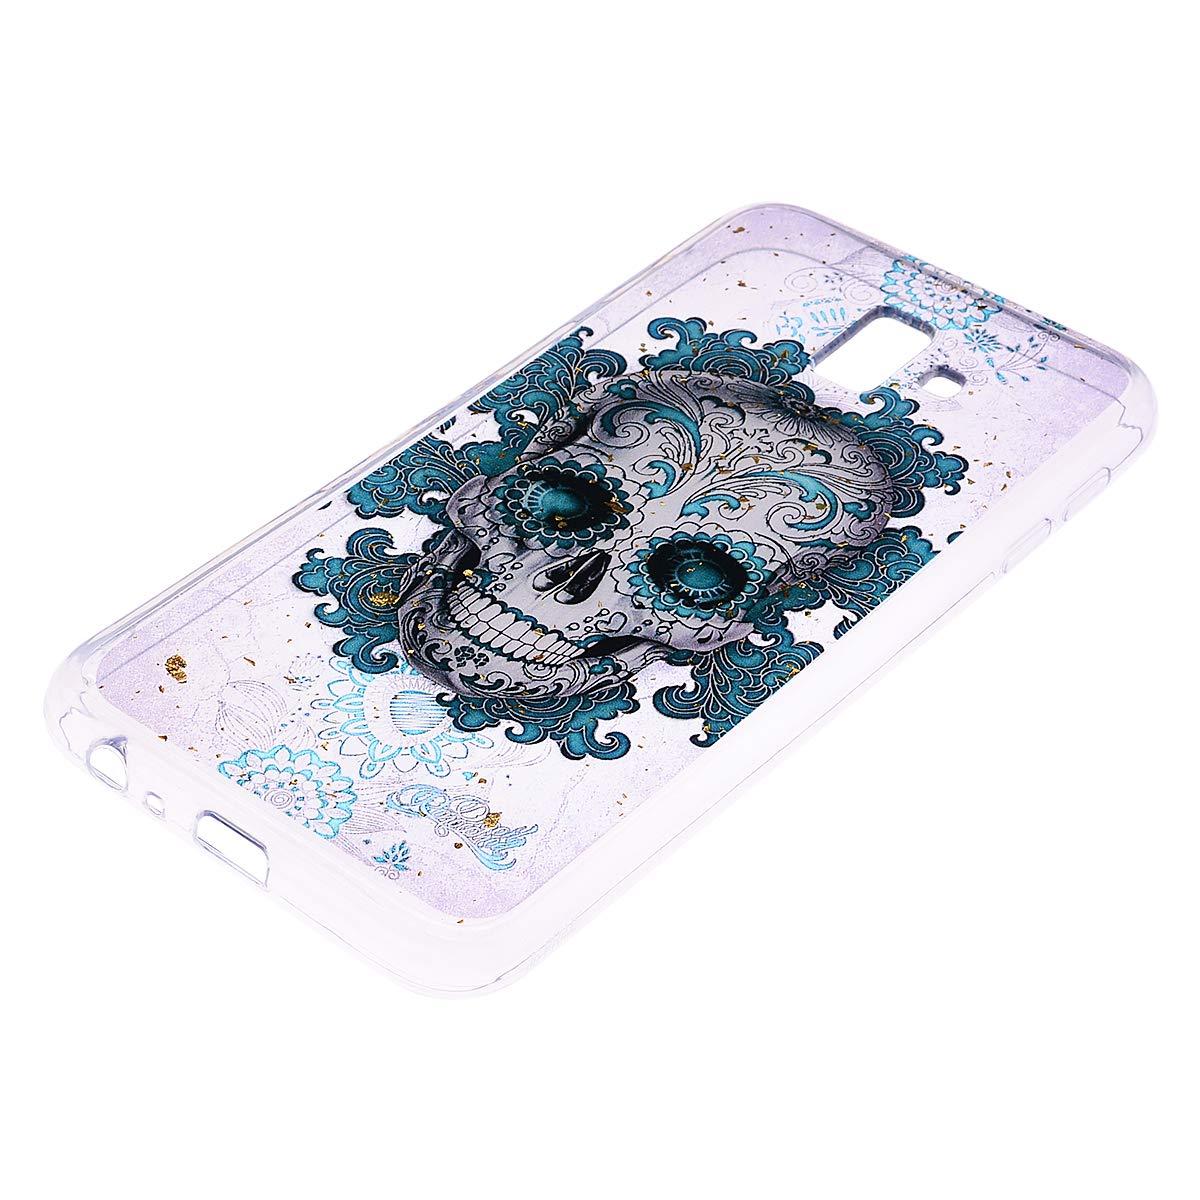 EuCase Funda Samsung J6 Plus 2018 Silicona Transparente con Dibujos Carcasa Galaxy J6 Plus 2018 Antigolpes Suave TPU Flexible Ultra Delgada Cubierta Protector Bumper Case para Caja Tapa Mandala